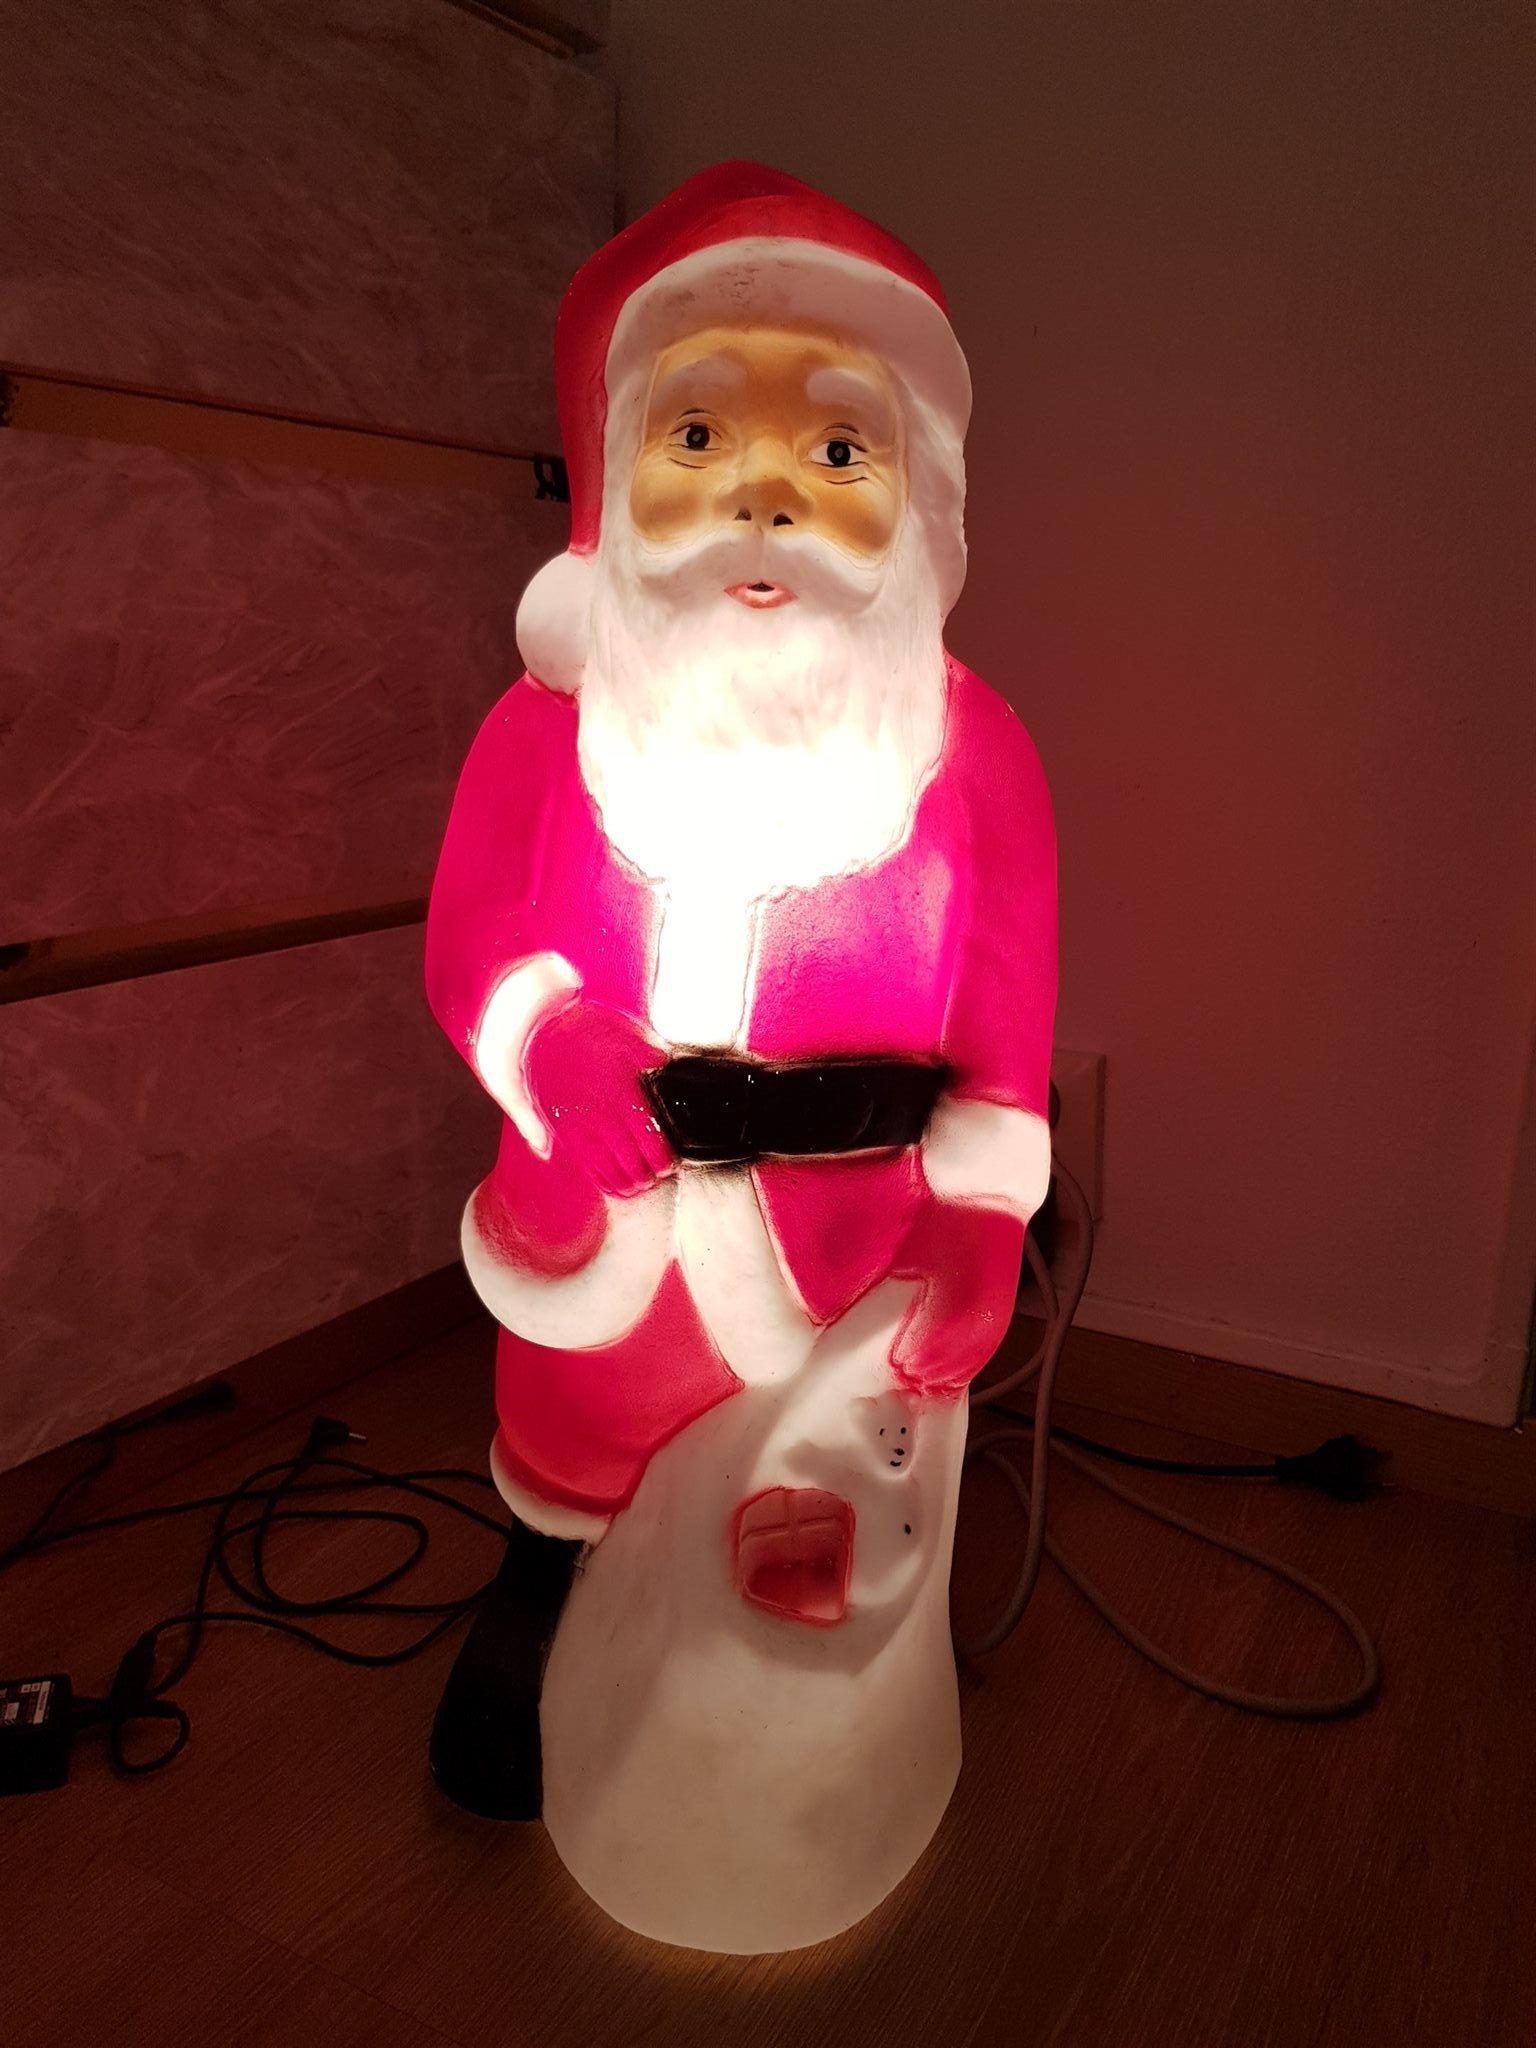 jultomte med belysning